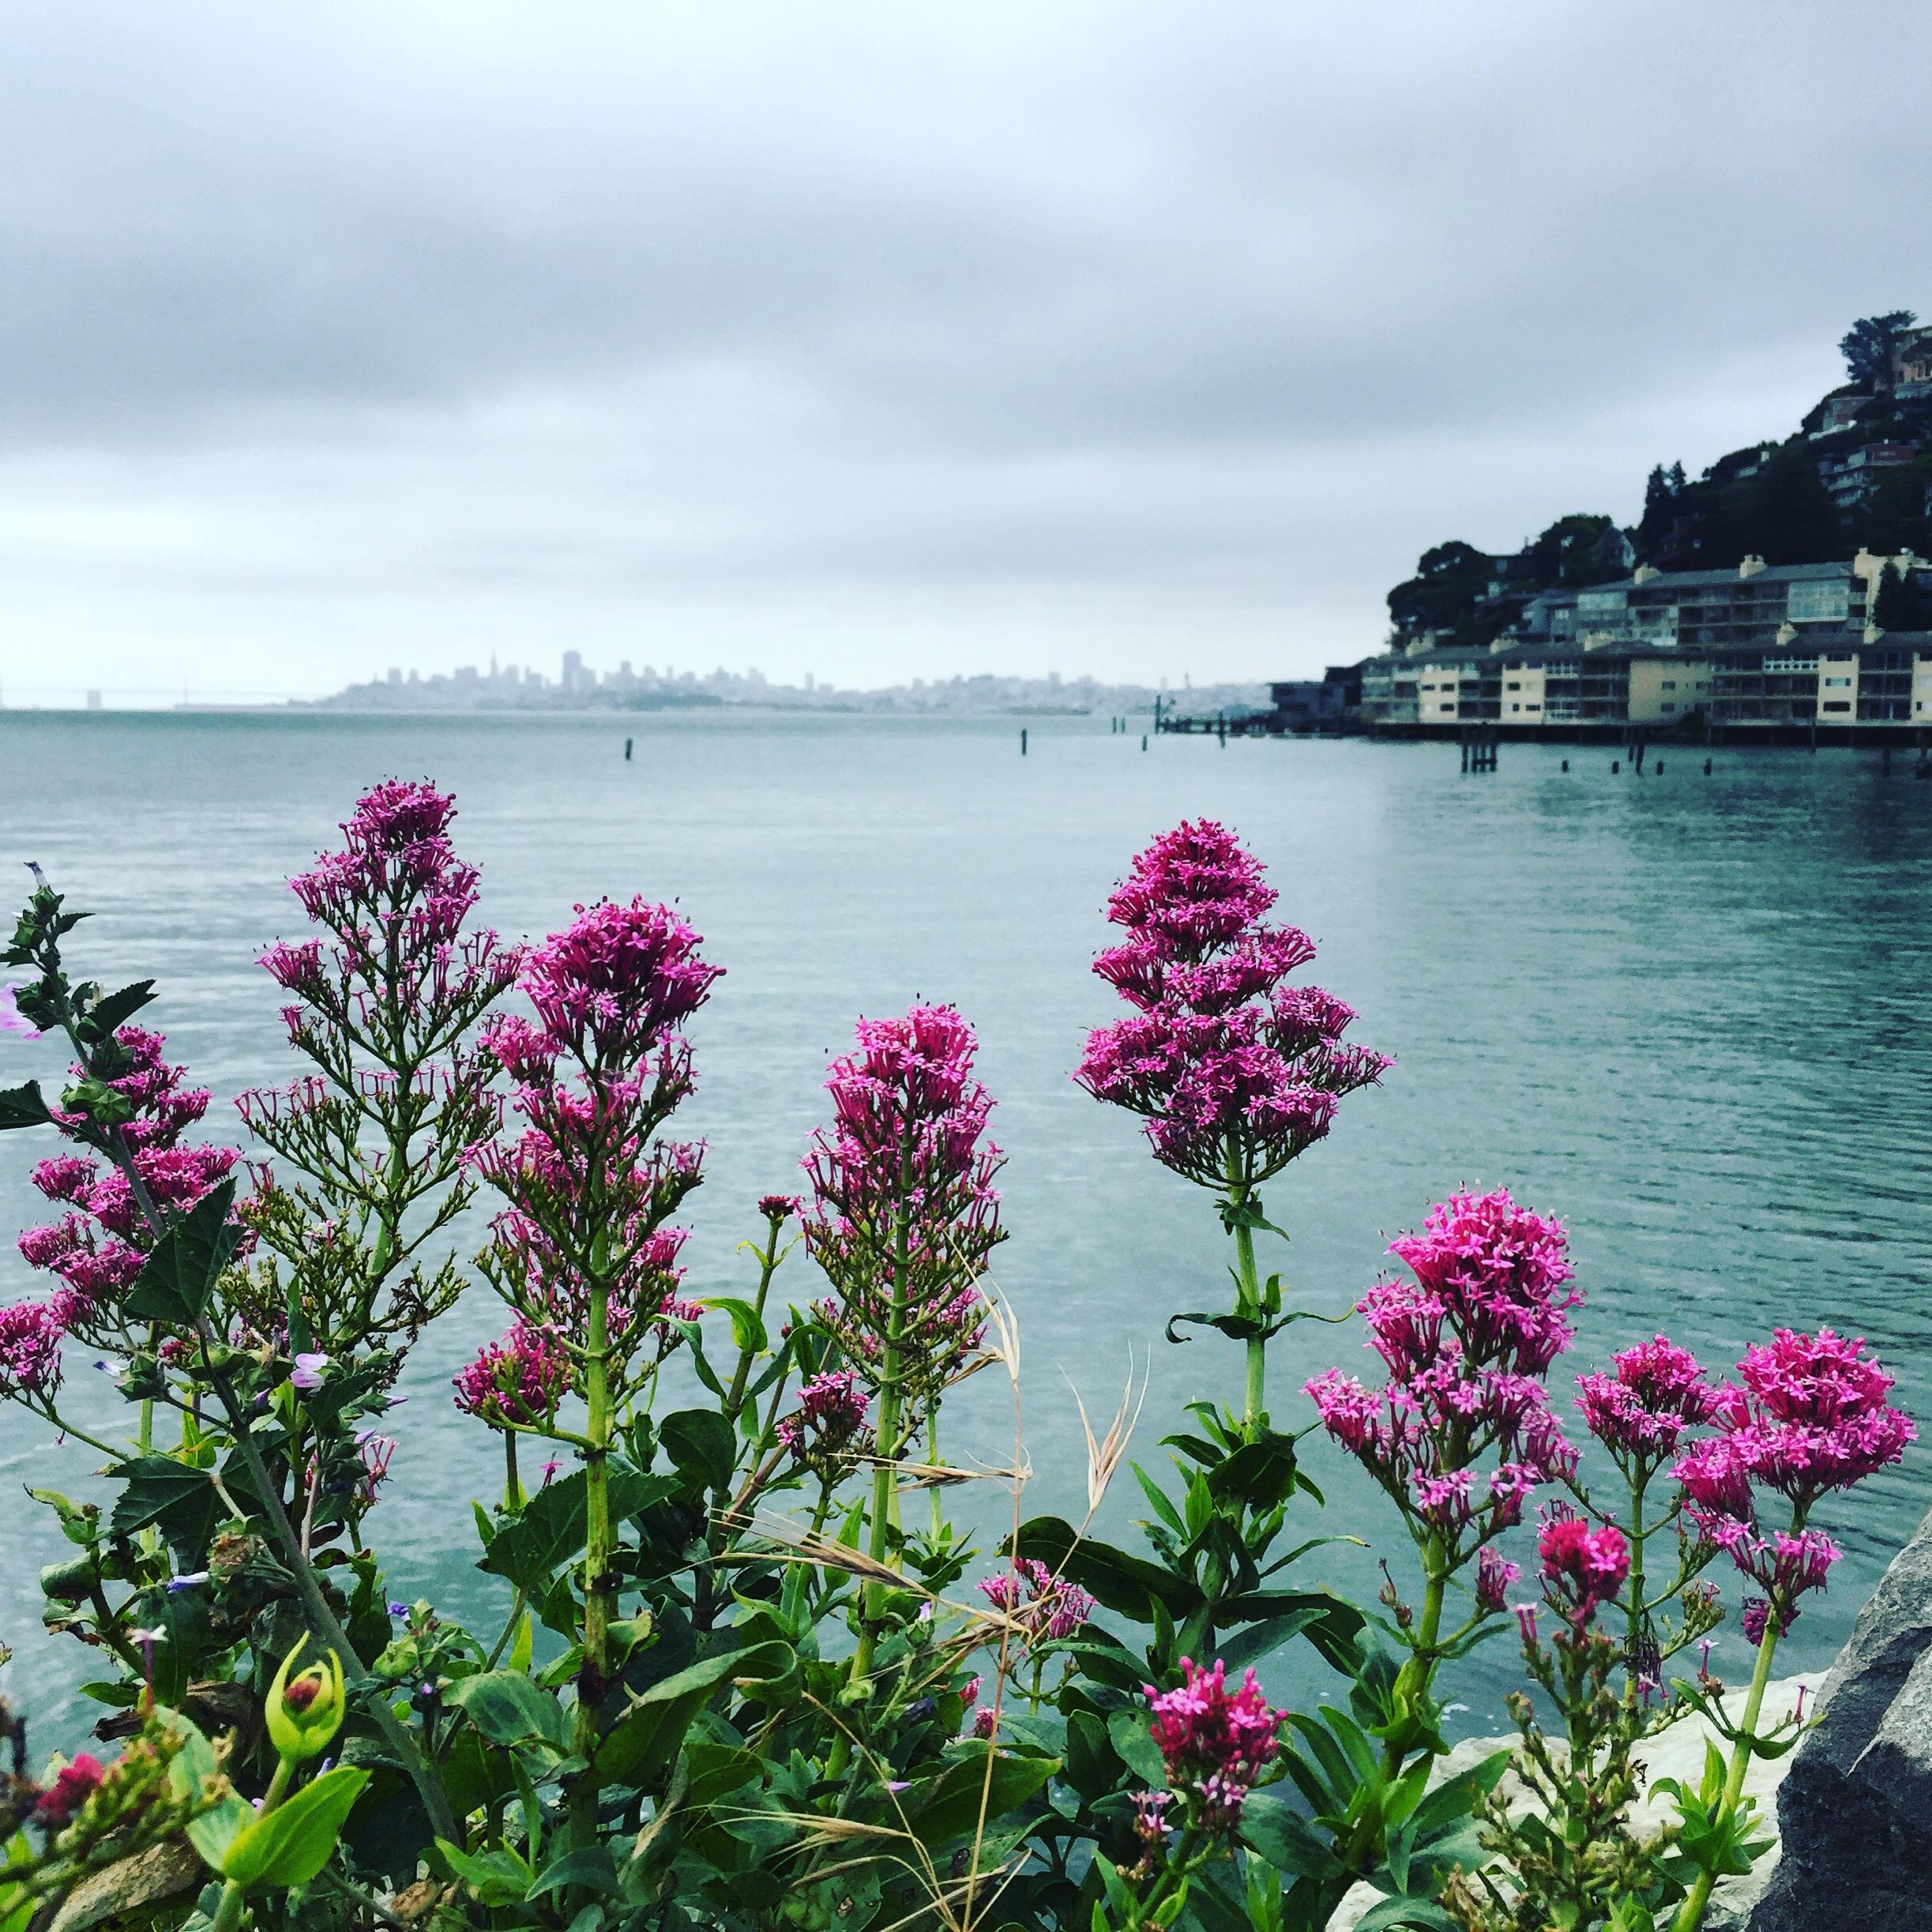 Taken in Sausalito, looking at San Francisco.